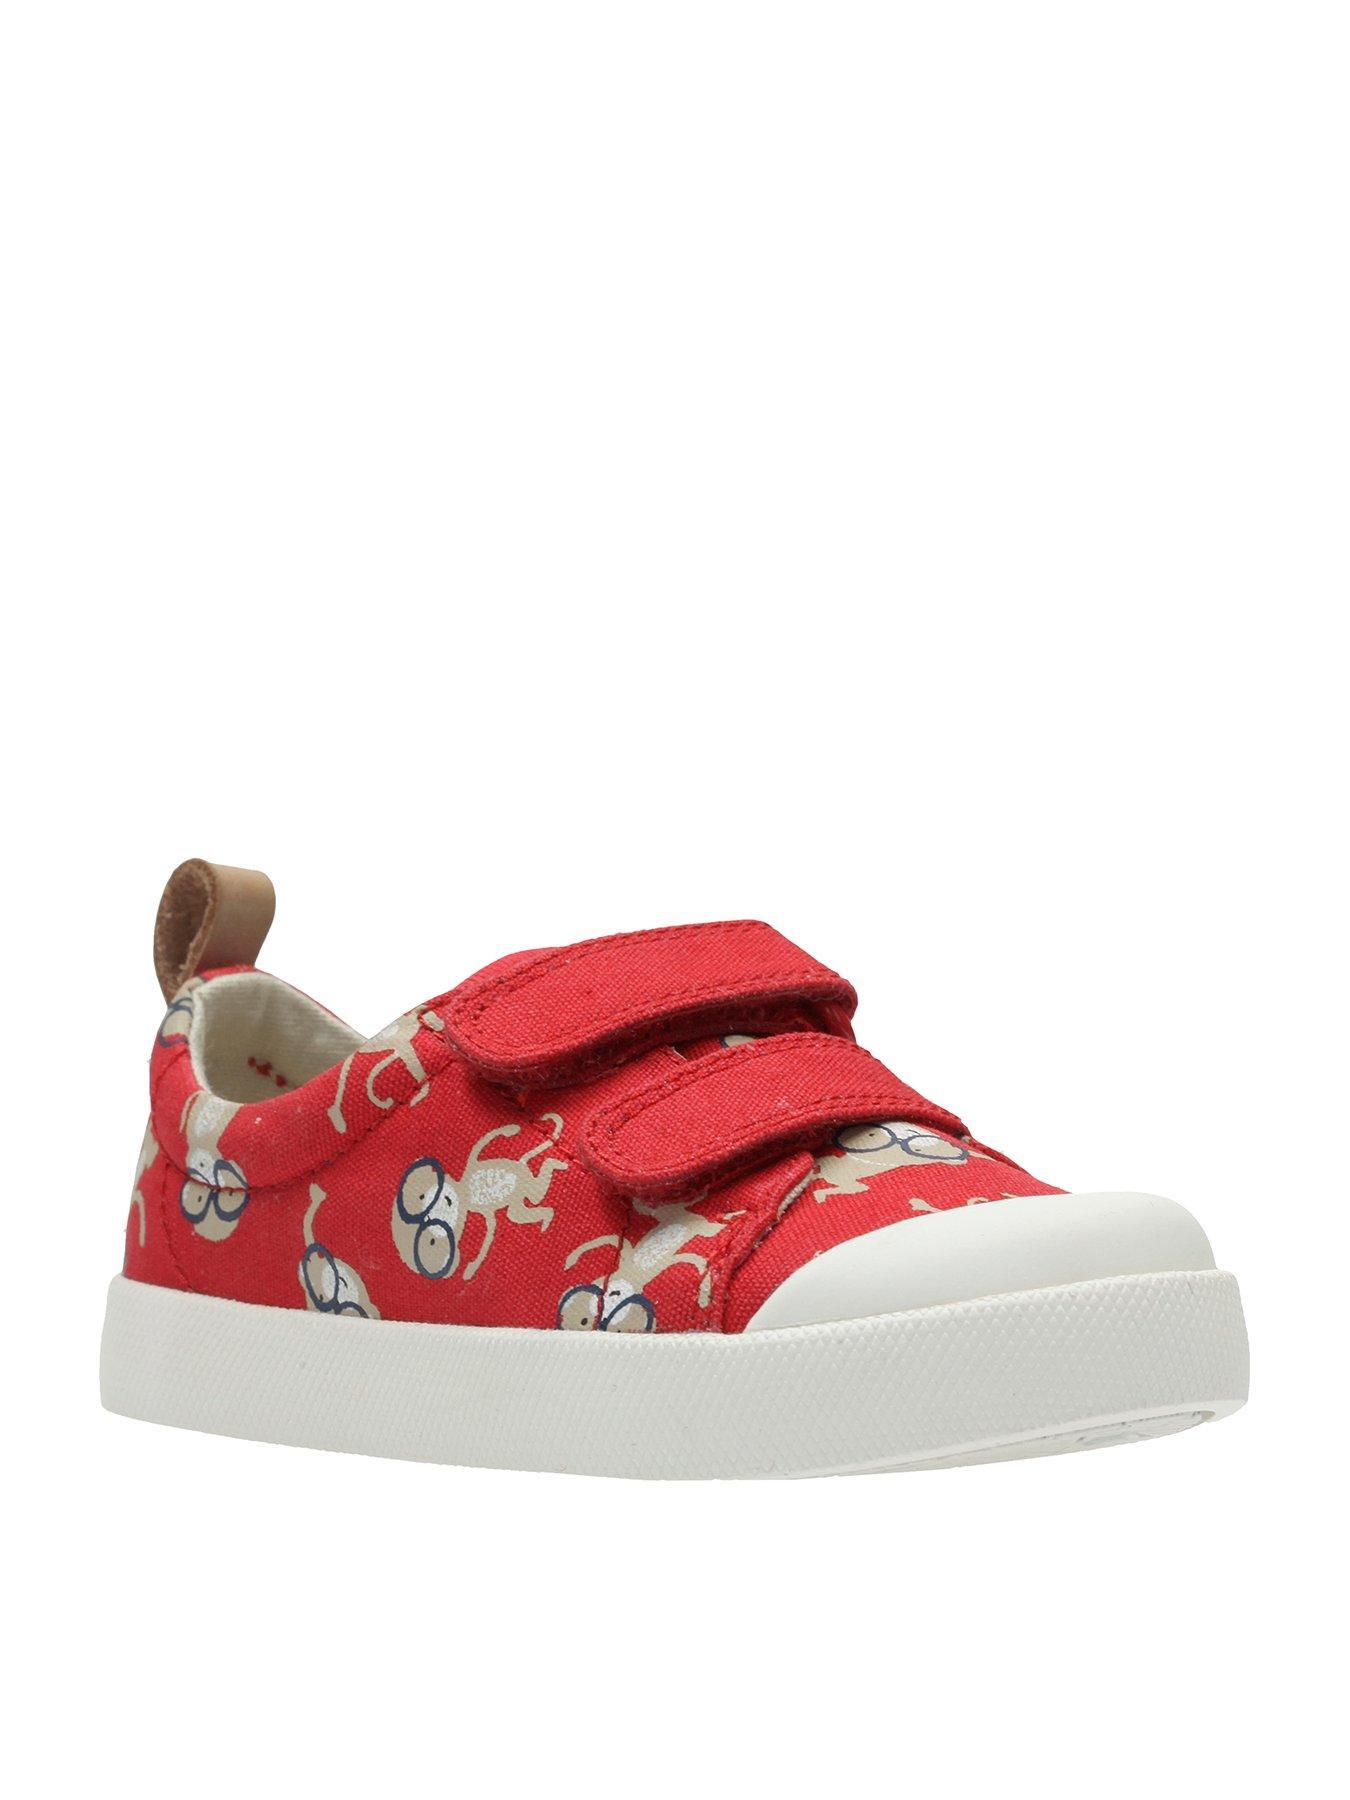 clarks kids shoes ireland online